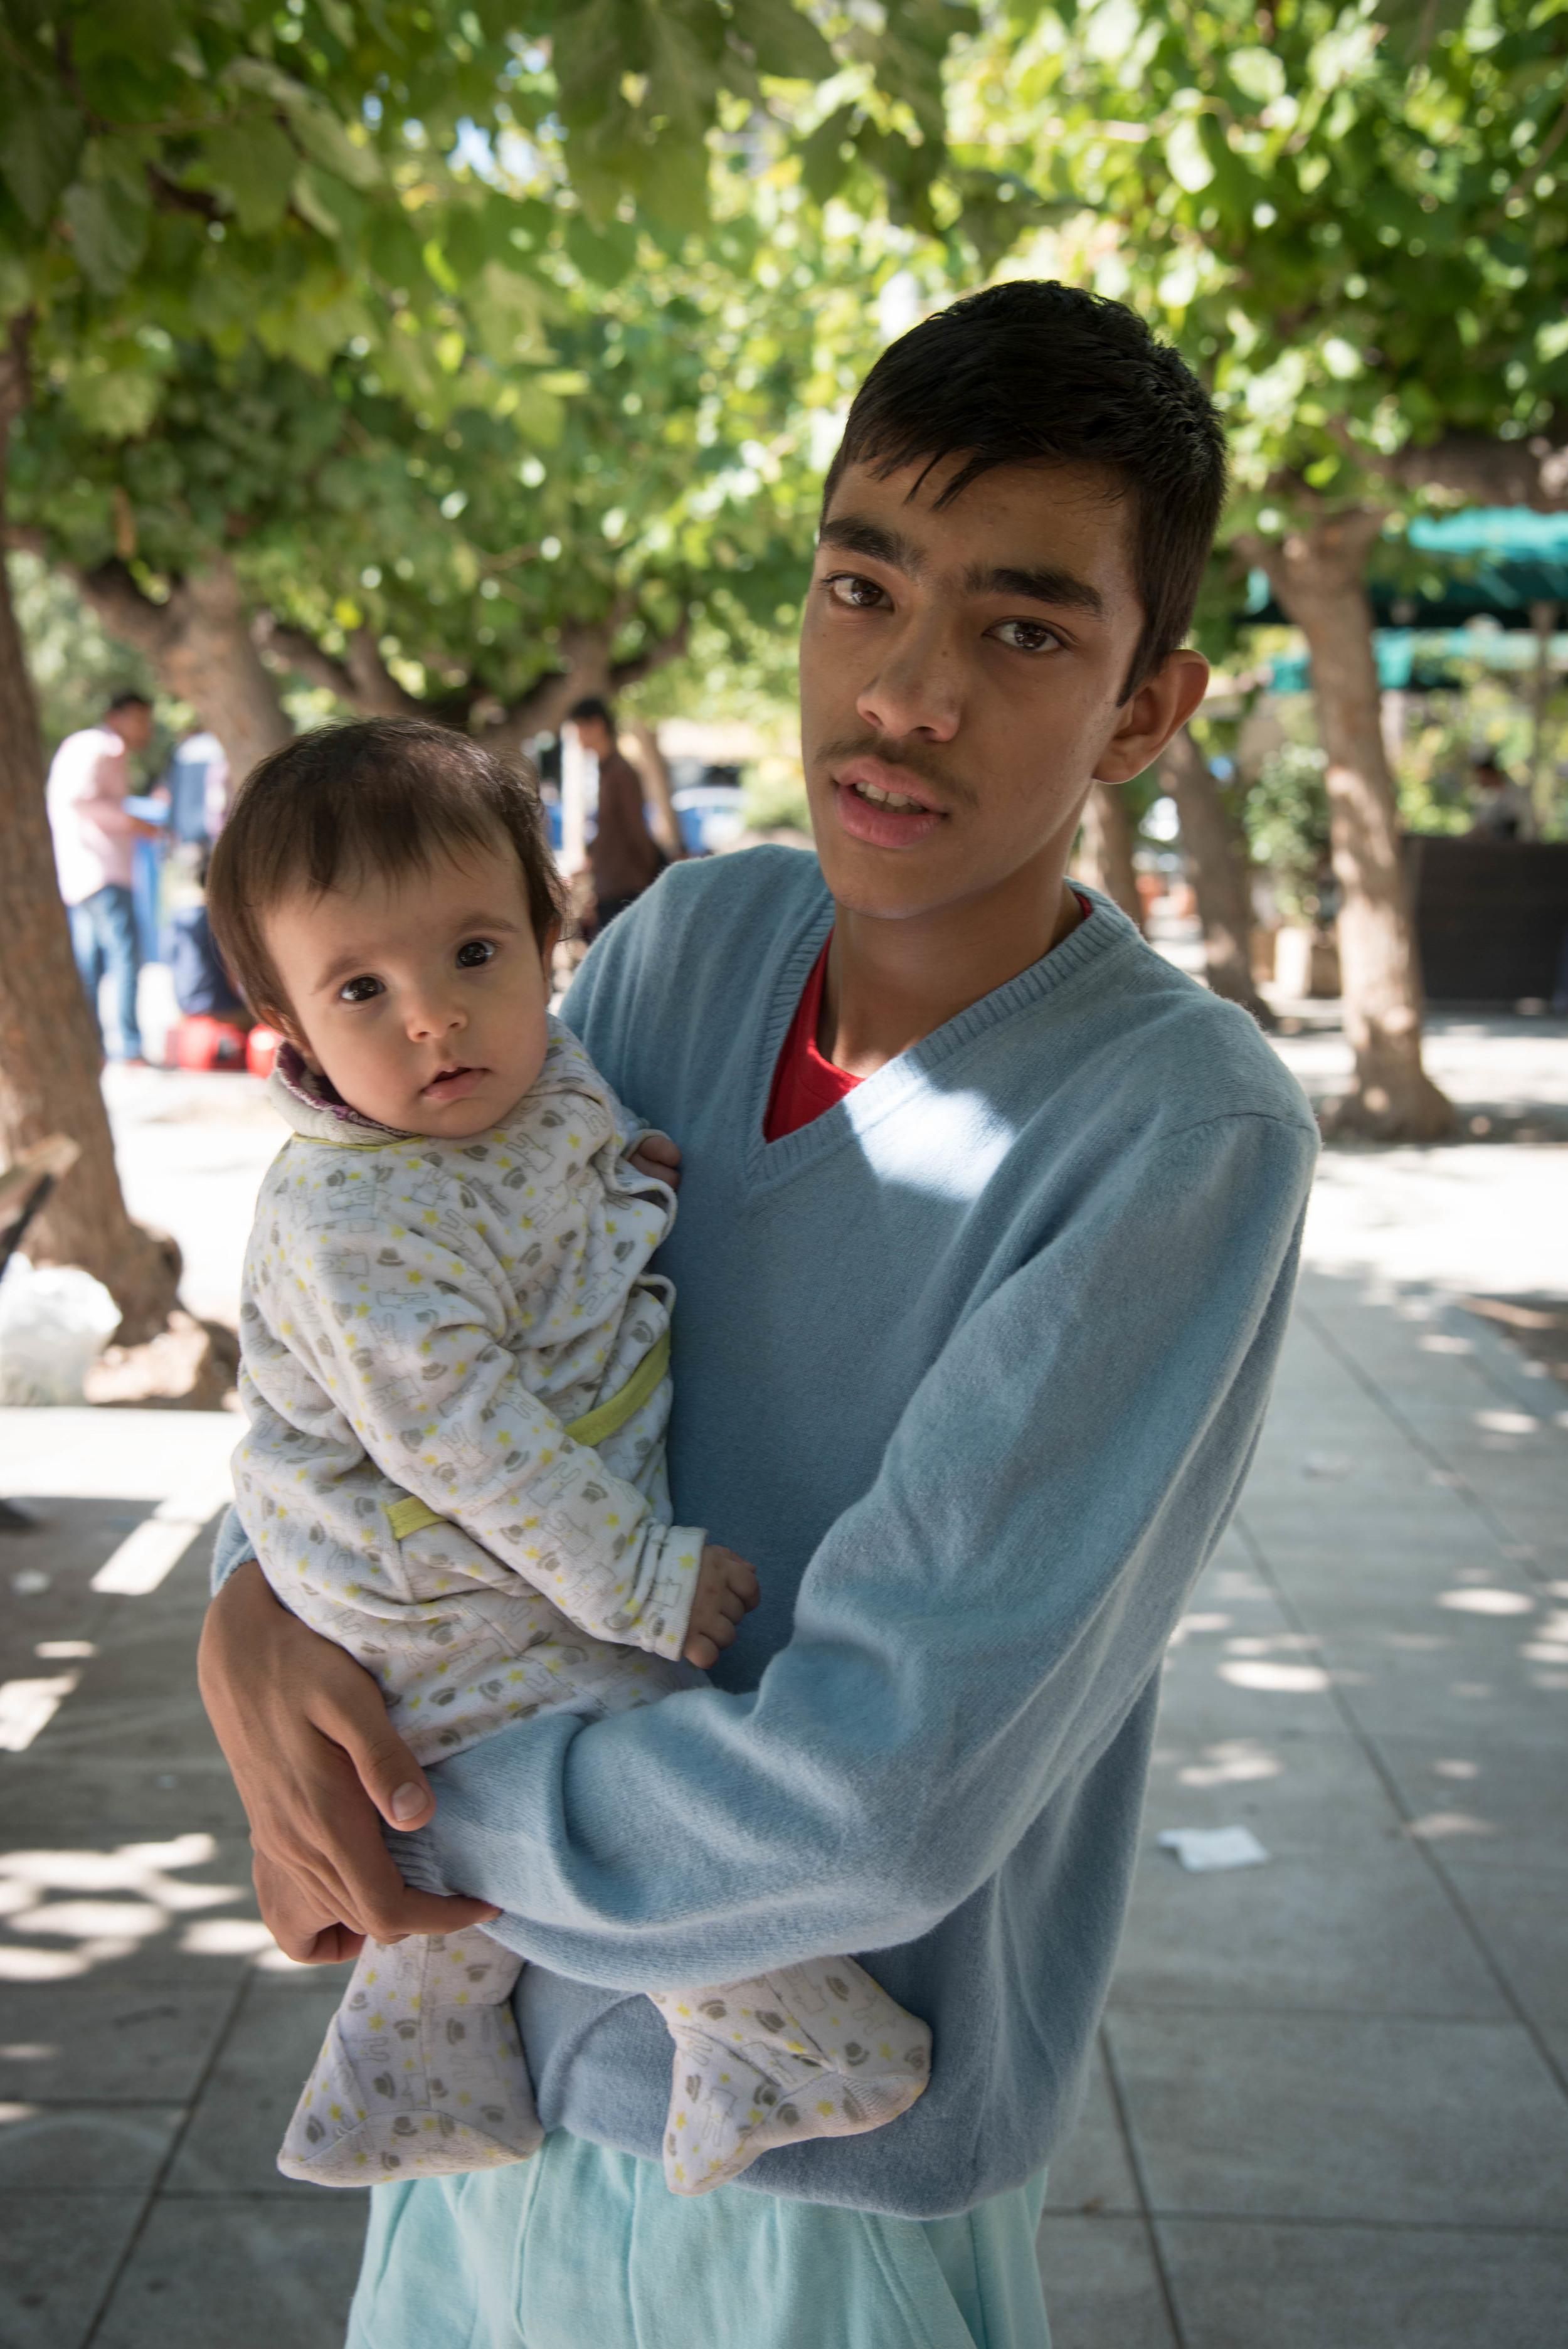 refugeescoloradocollege-8048.jpg